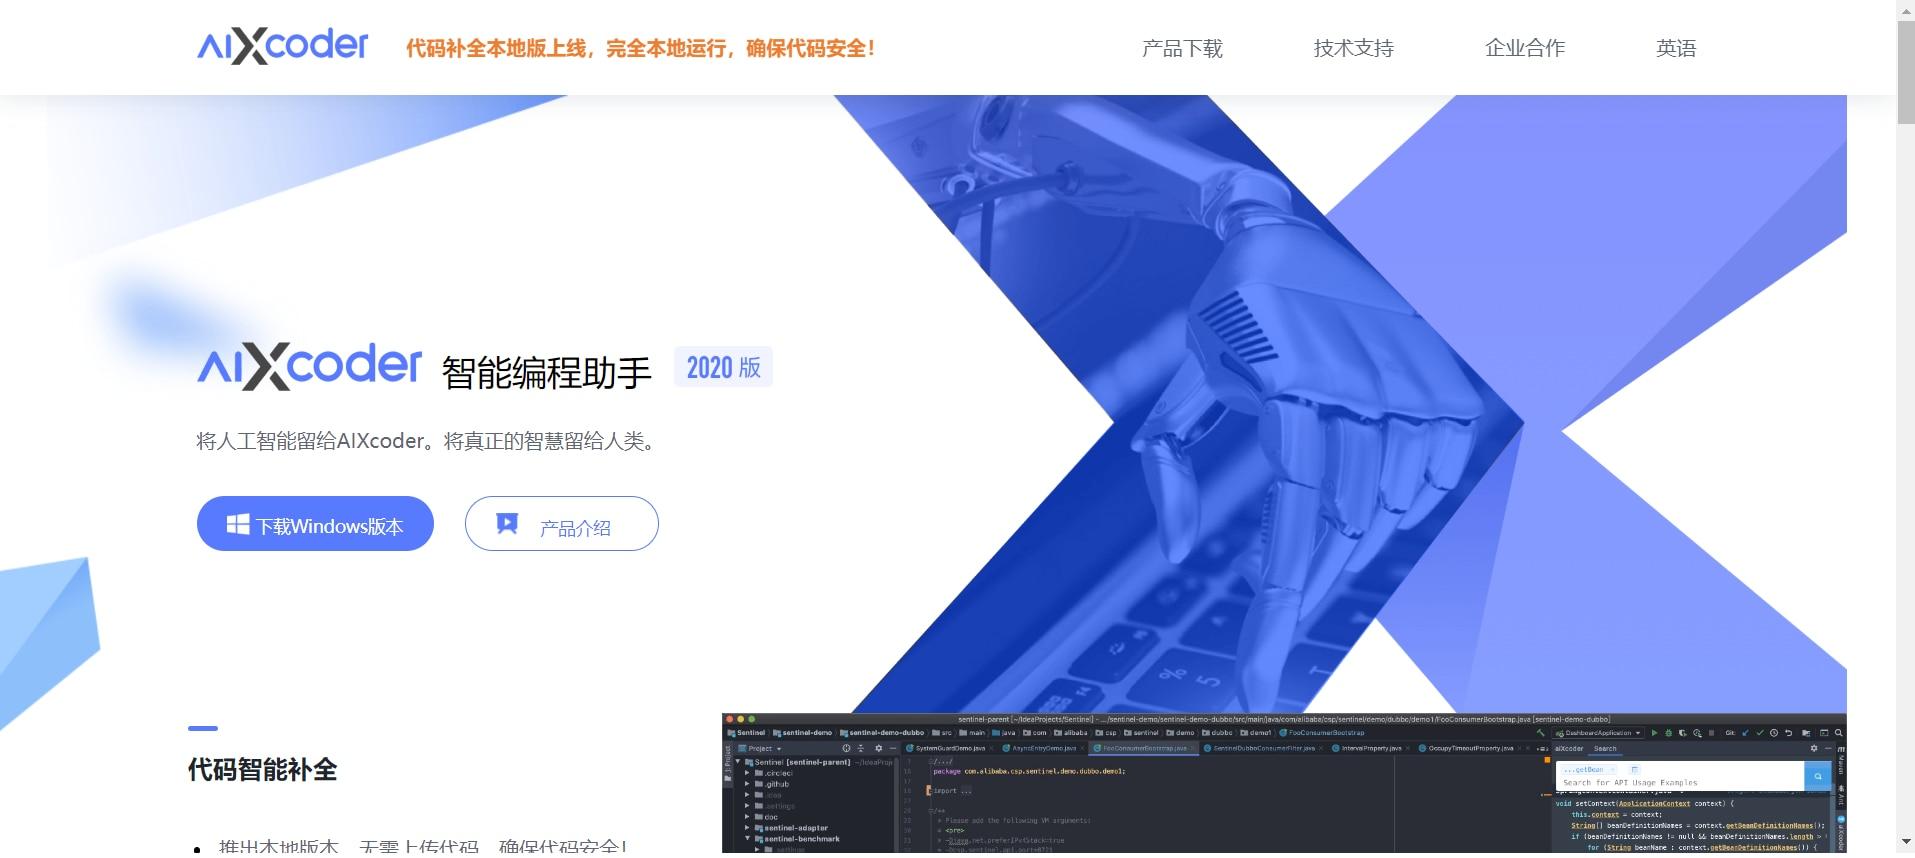 aiXcoder智能编程助手 2020版 新版发布